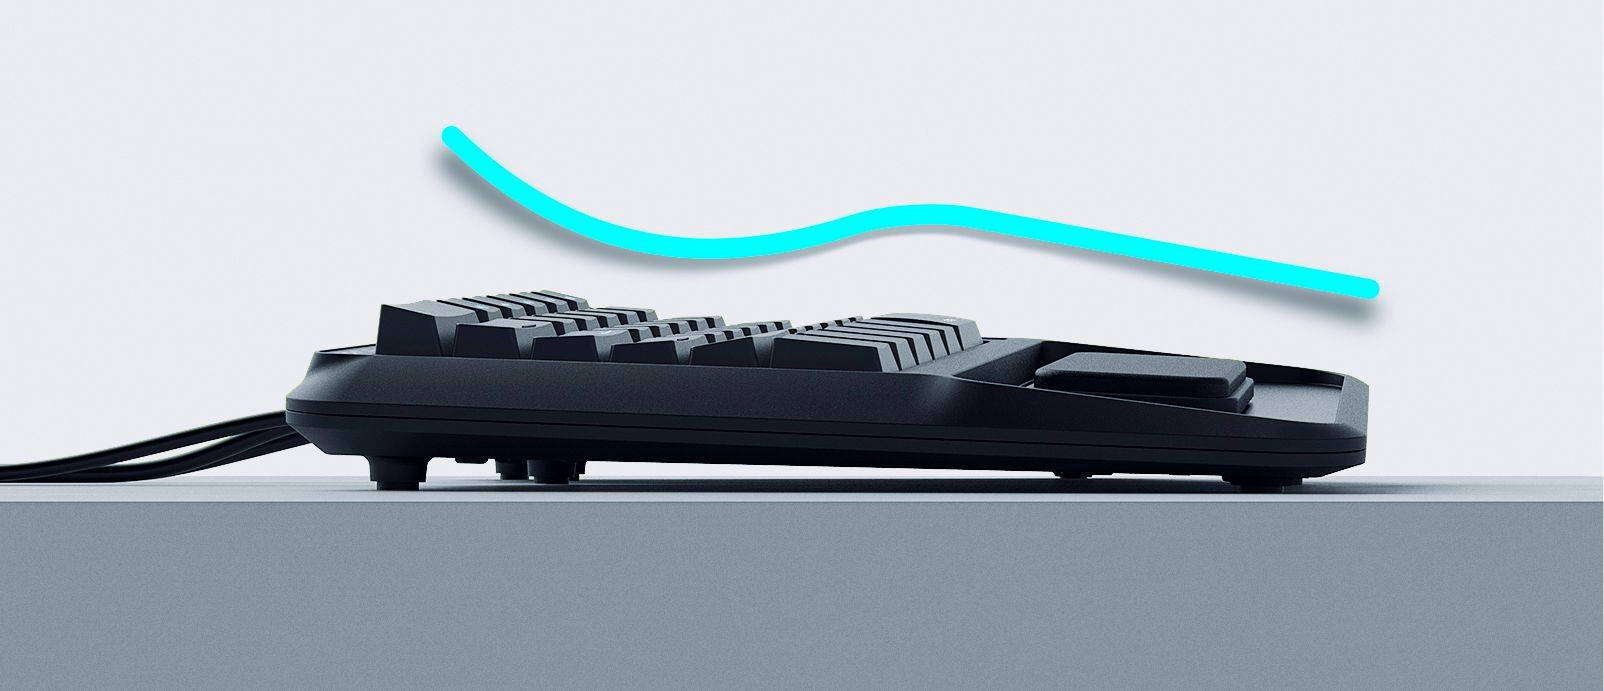 mechanical ergonomic keyboard palm wrist rest typing